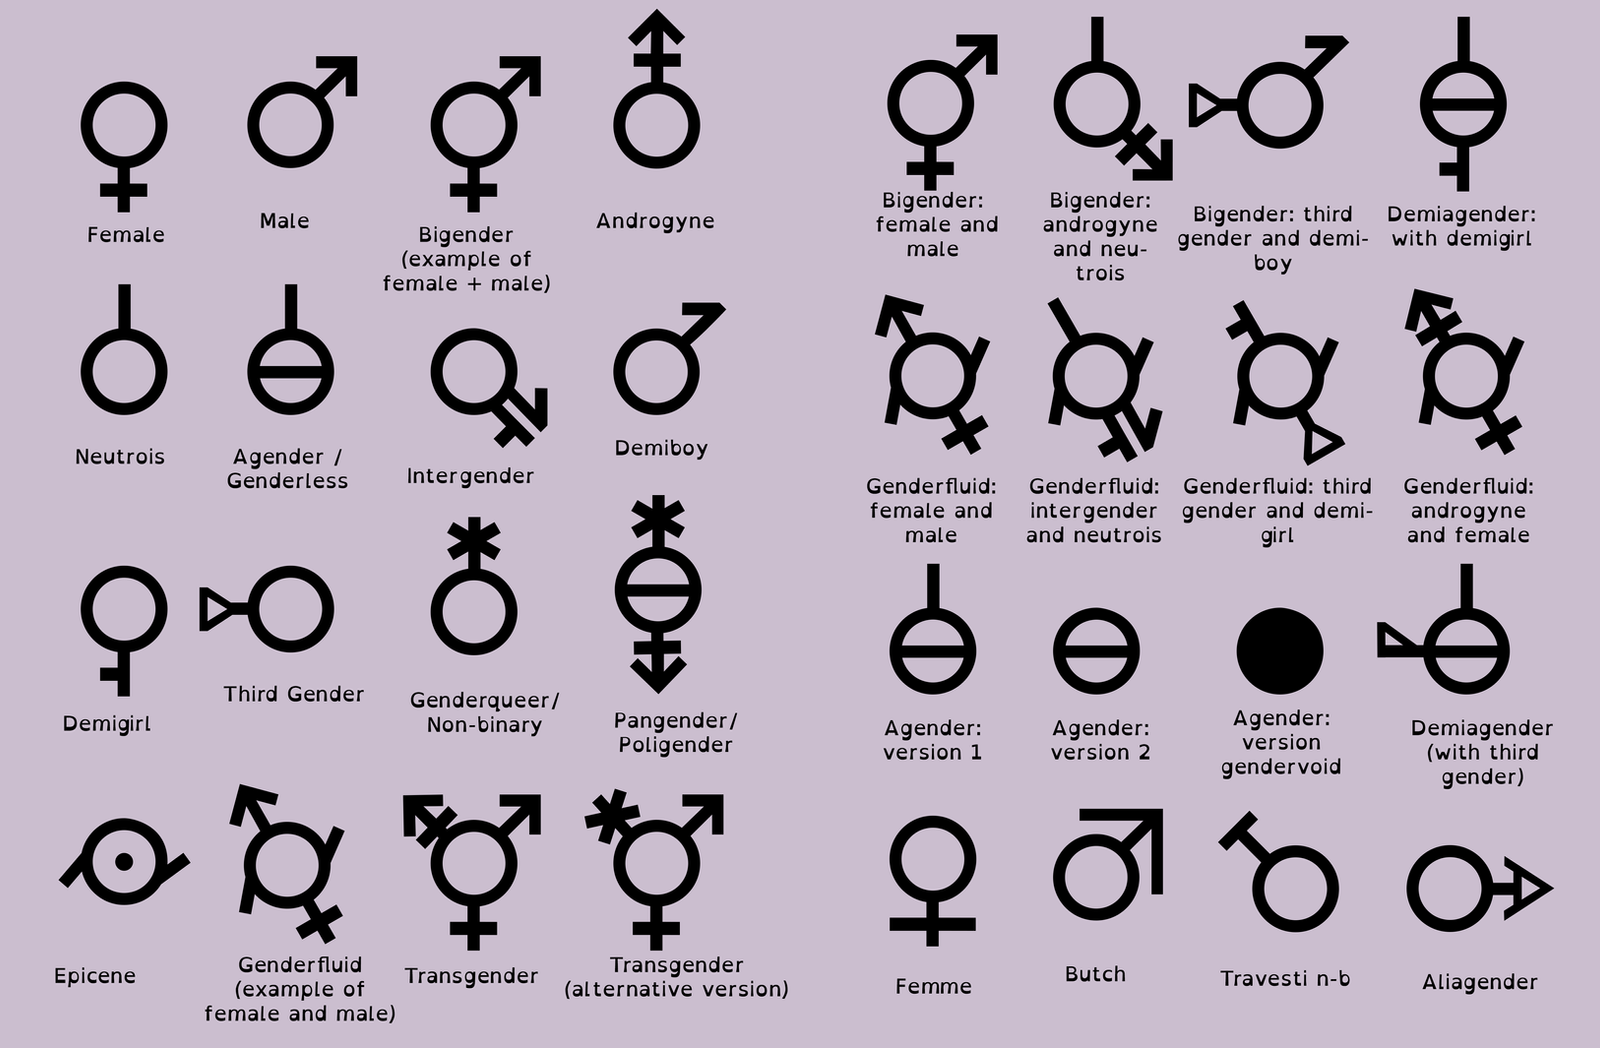 Gender symbols by cari rez lobo on deviantart gender symbols by cari rez lobo buycottarizona